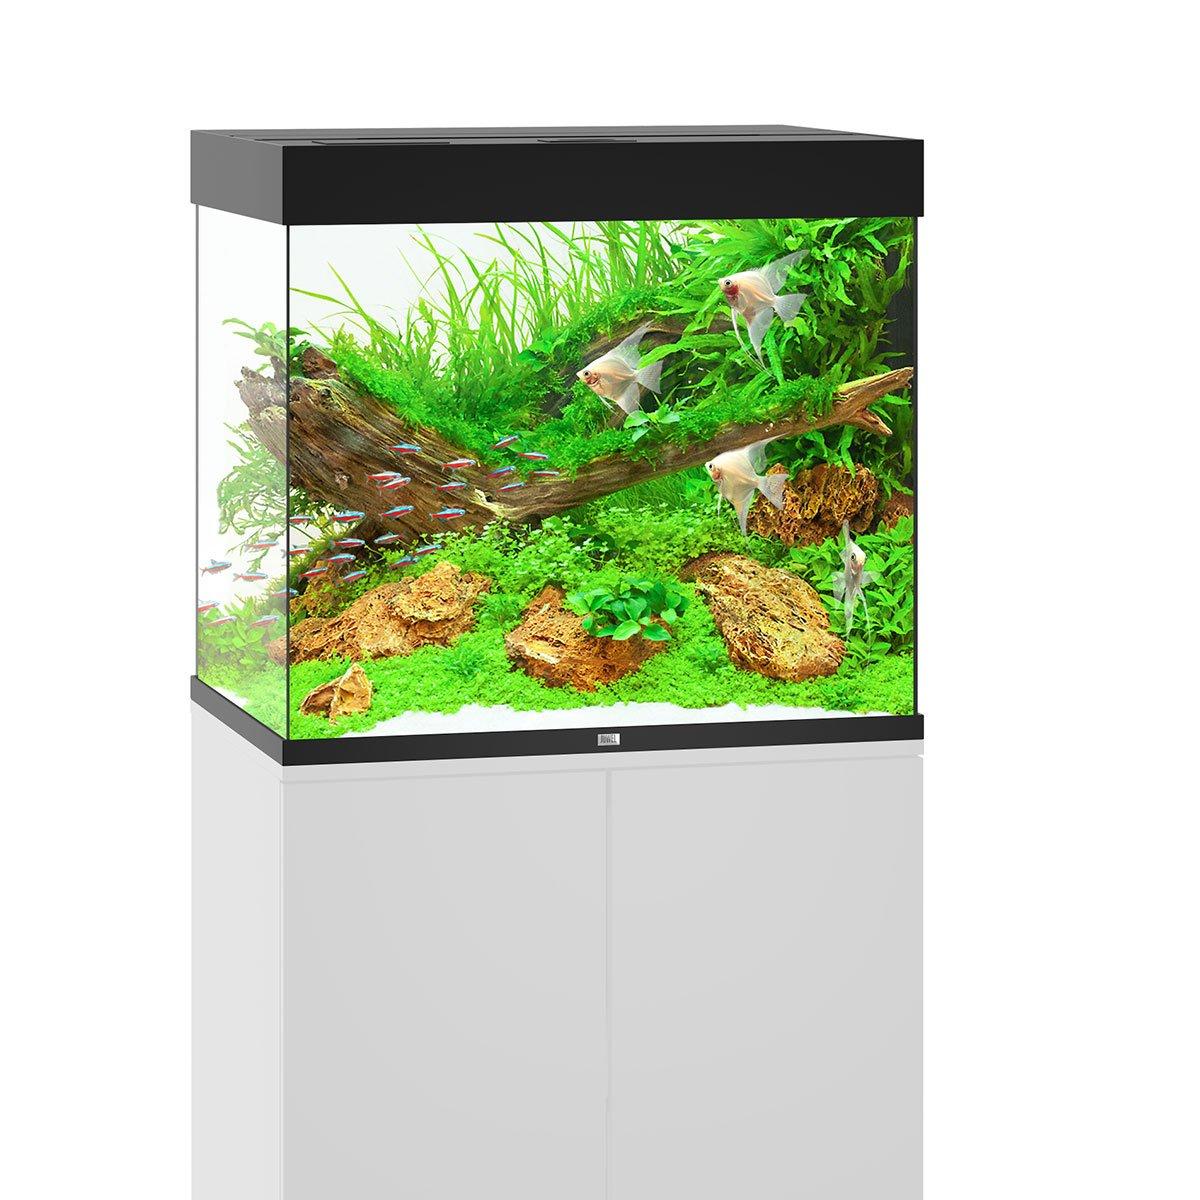 Juwel Lido 200 LED Komplett Aquarium ohne Schrank bei ZooRoyal